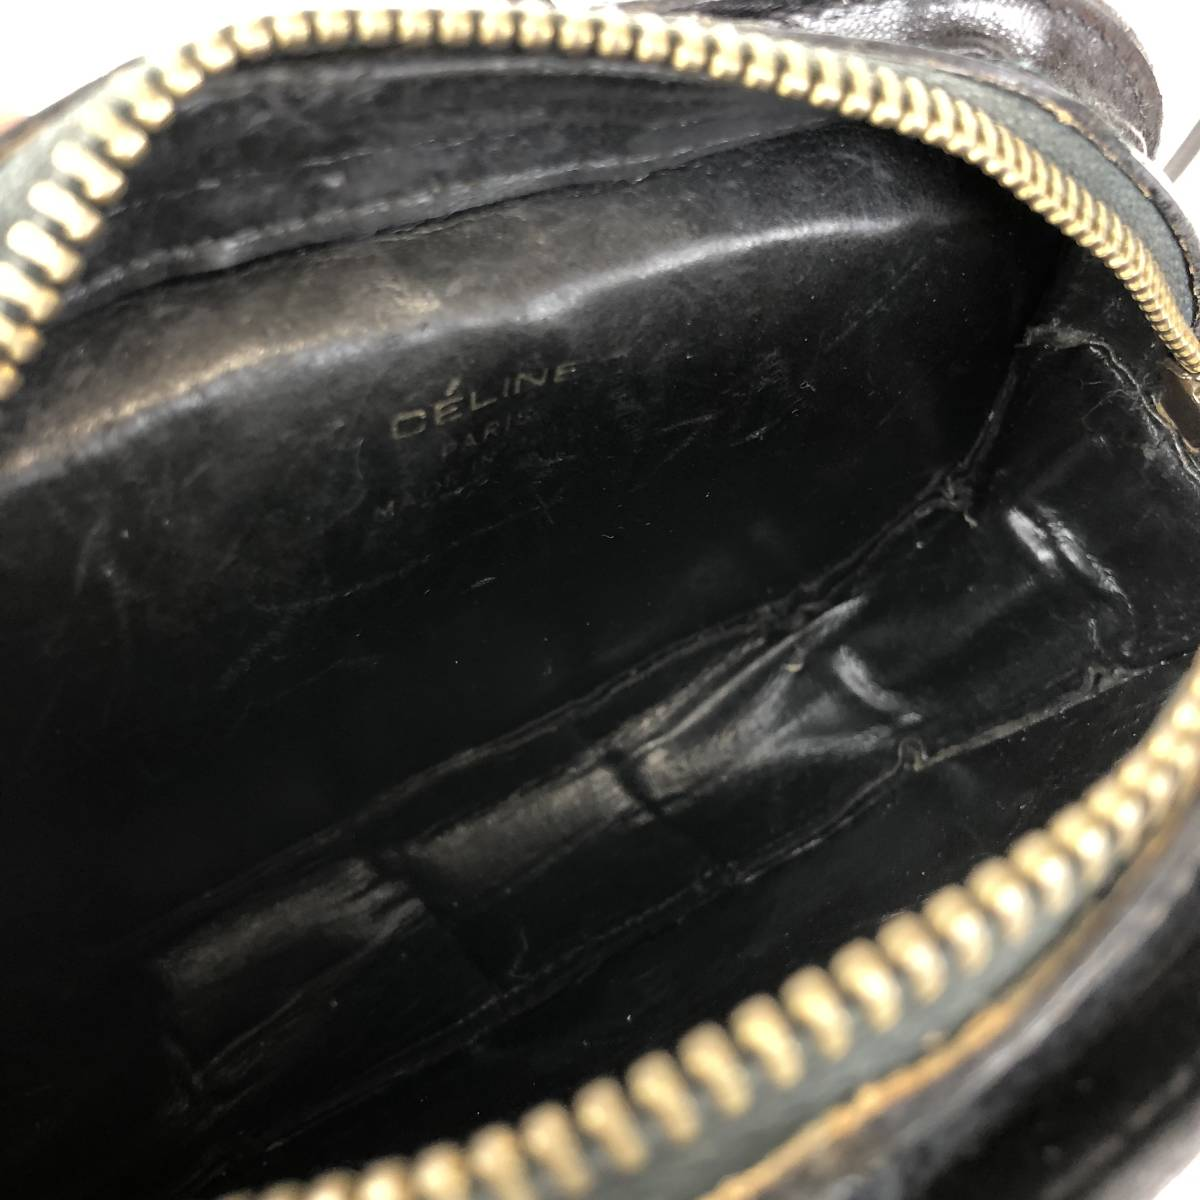 890aef20ee34 CELINE セリーヌ ショルダーバッグ クロコ型押し 馬車金具 ポシェット ブラック 黒 オールドセリーヌ ヴィンテージ vintage  EasyPaymentIcon. 出价次数: 36 出价纪录